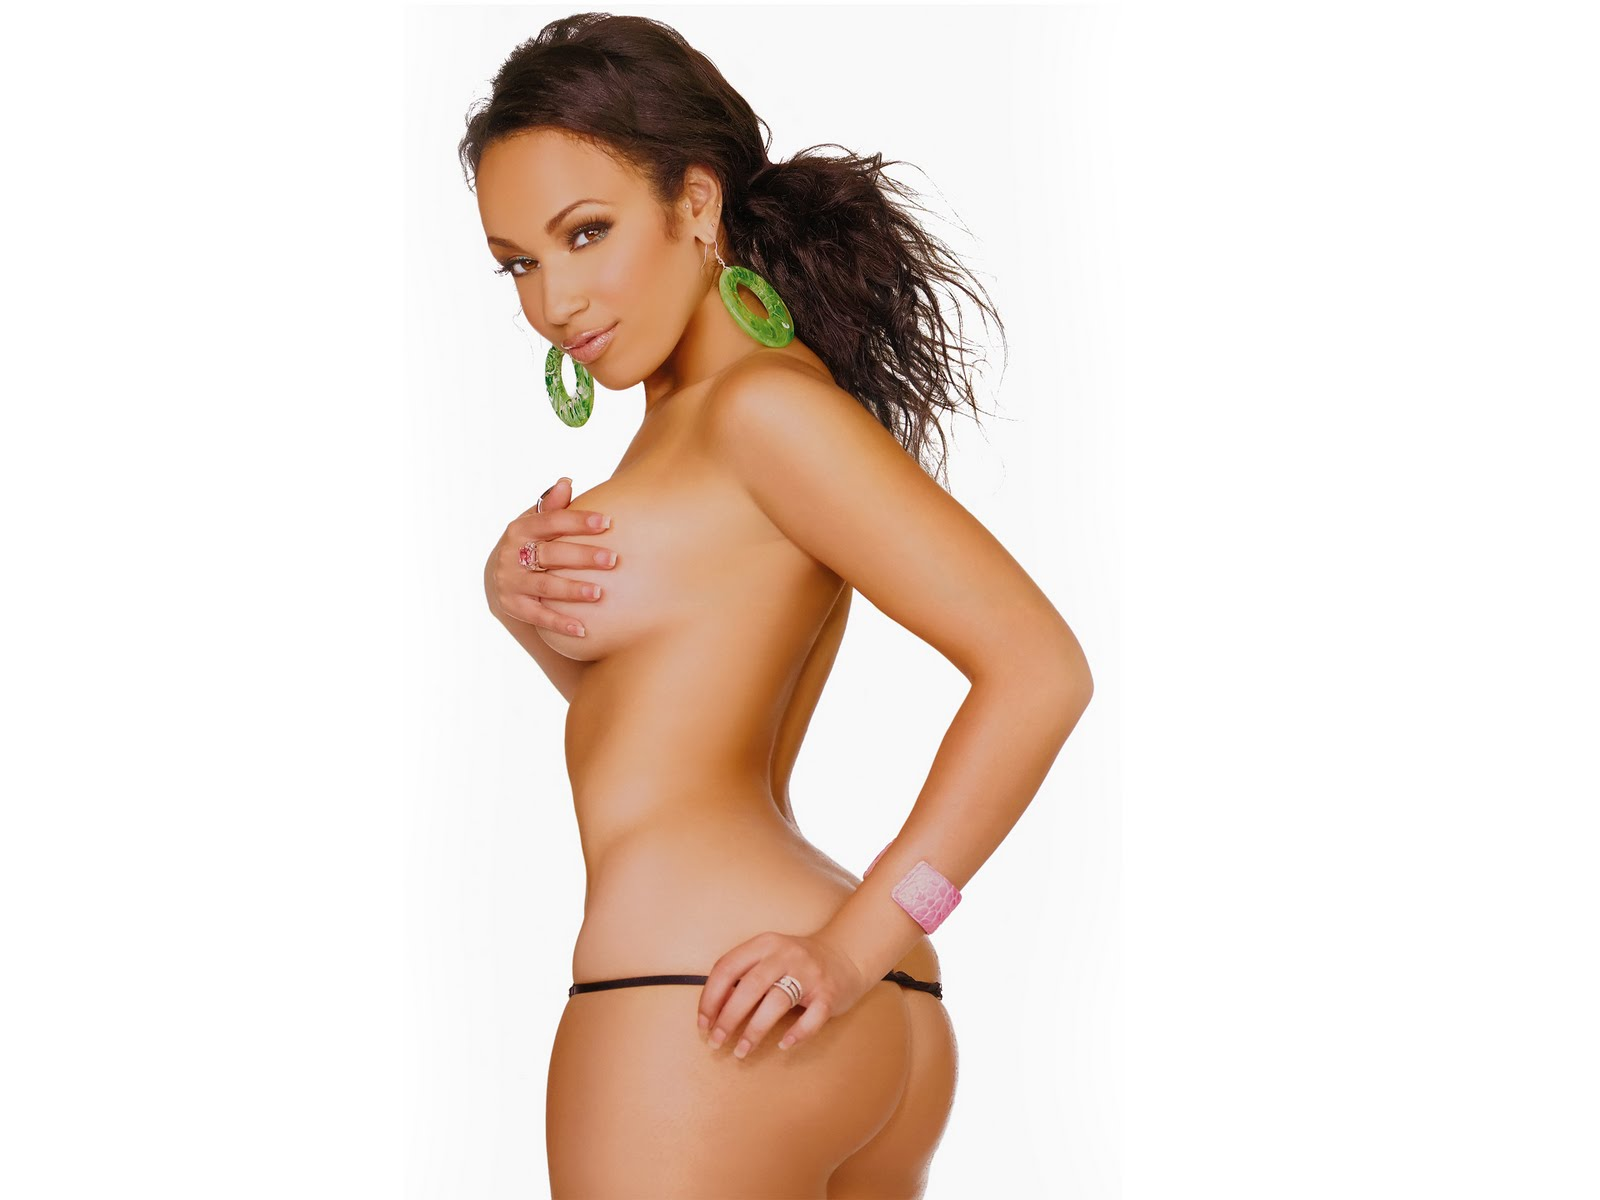 http://4.bp.blogspot.com/-8iw4LmSv2g8/TbktgbLdAWI/AAAAAAAACbY/VBxysalR8MI/s1600/Erotic%252BGirl%252B%2525252824%25252529.jpg